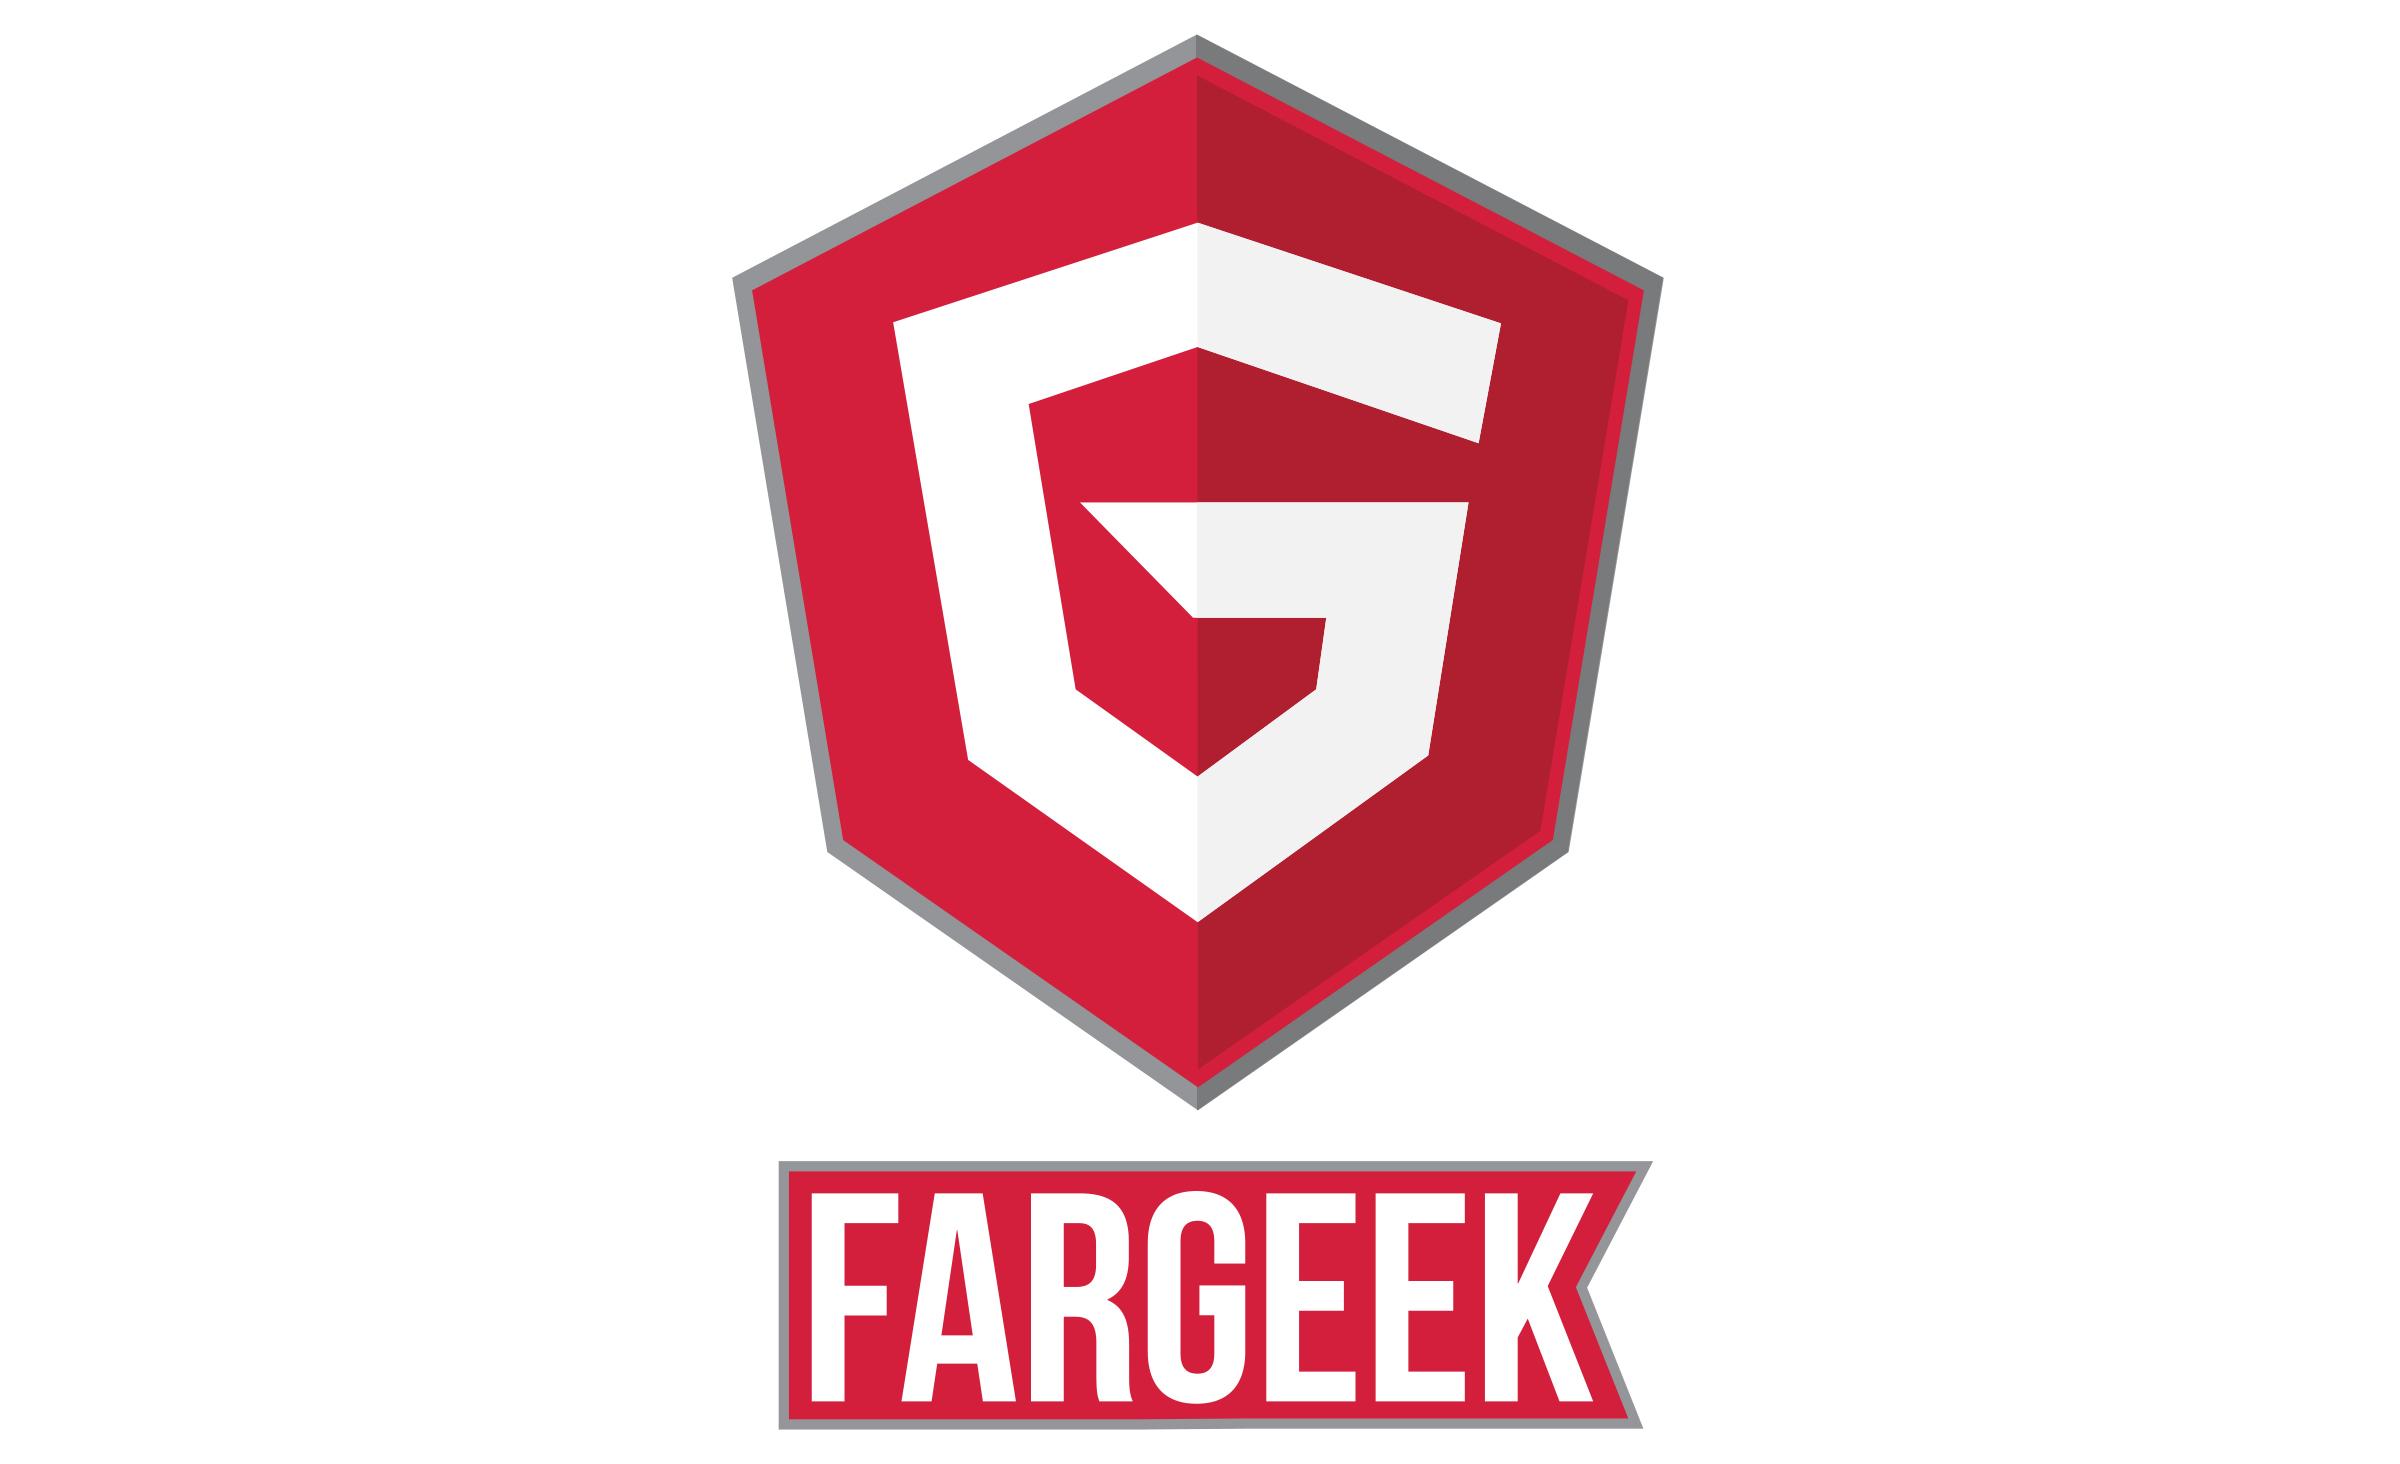 Domains.FarGeek.com